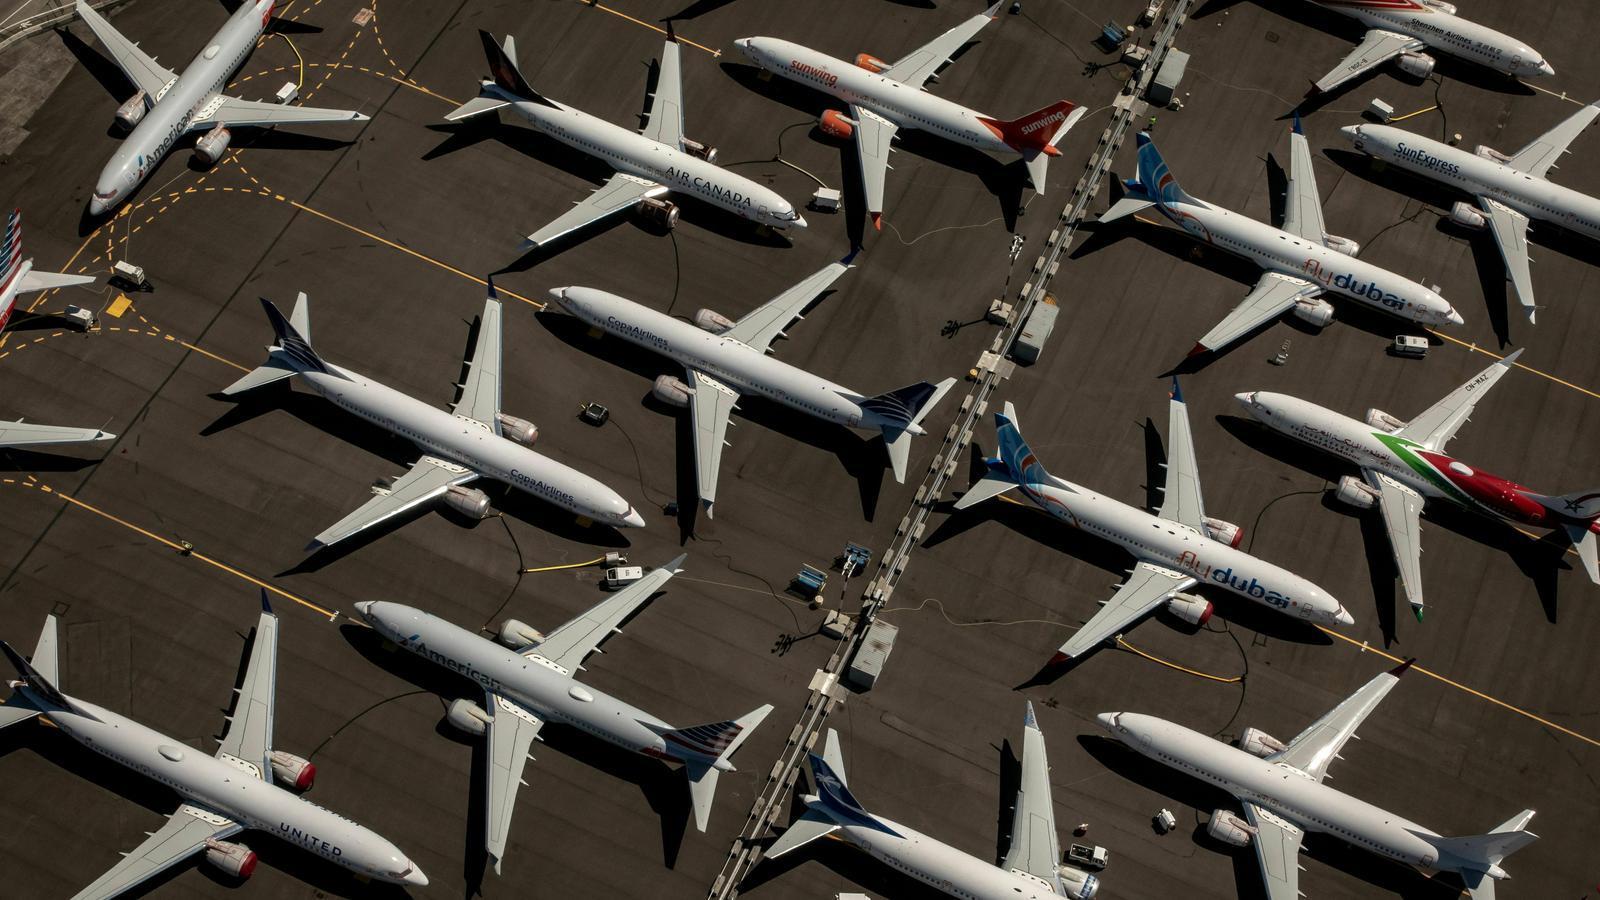 Cancel·lacions fins a l'abril a American Airlines i Southwest Airlines pels problemes del Boeing 737 Max